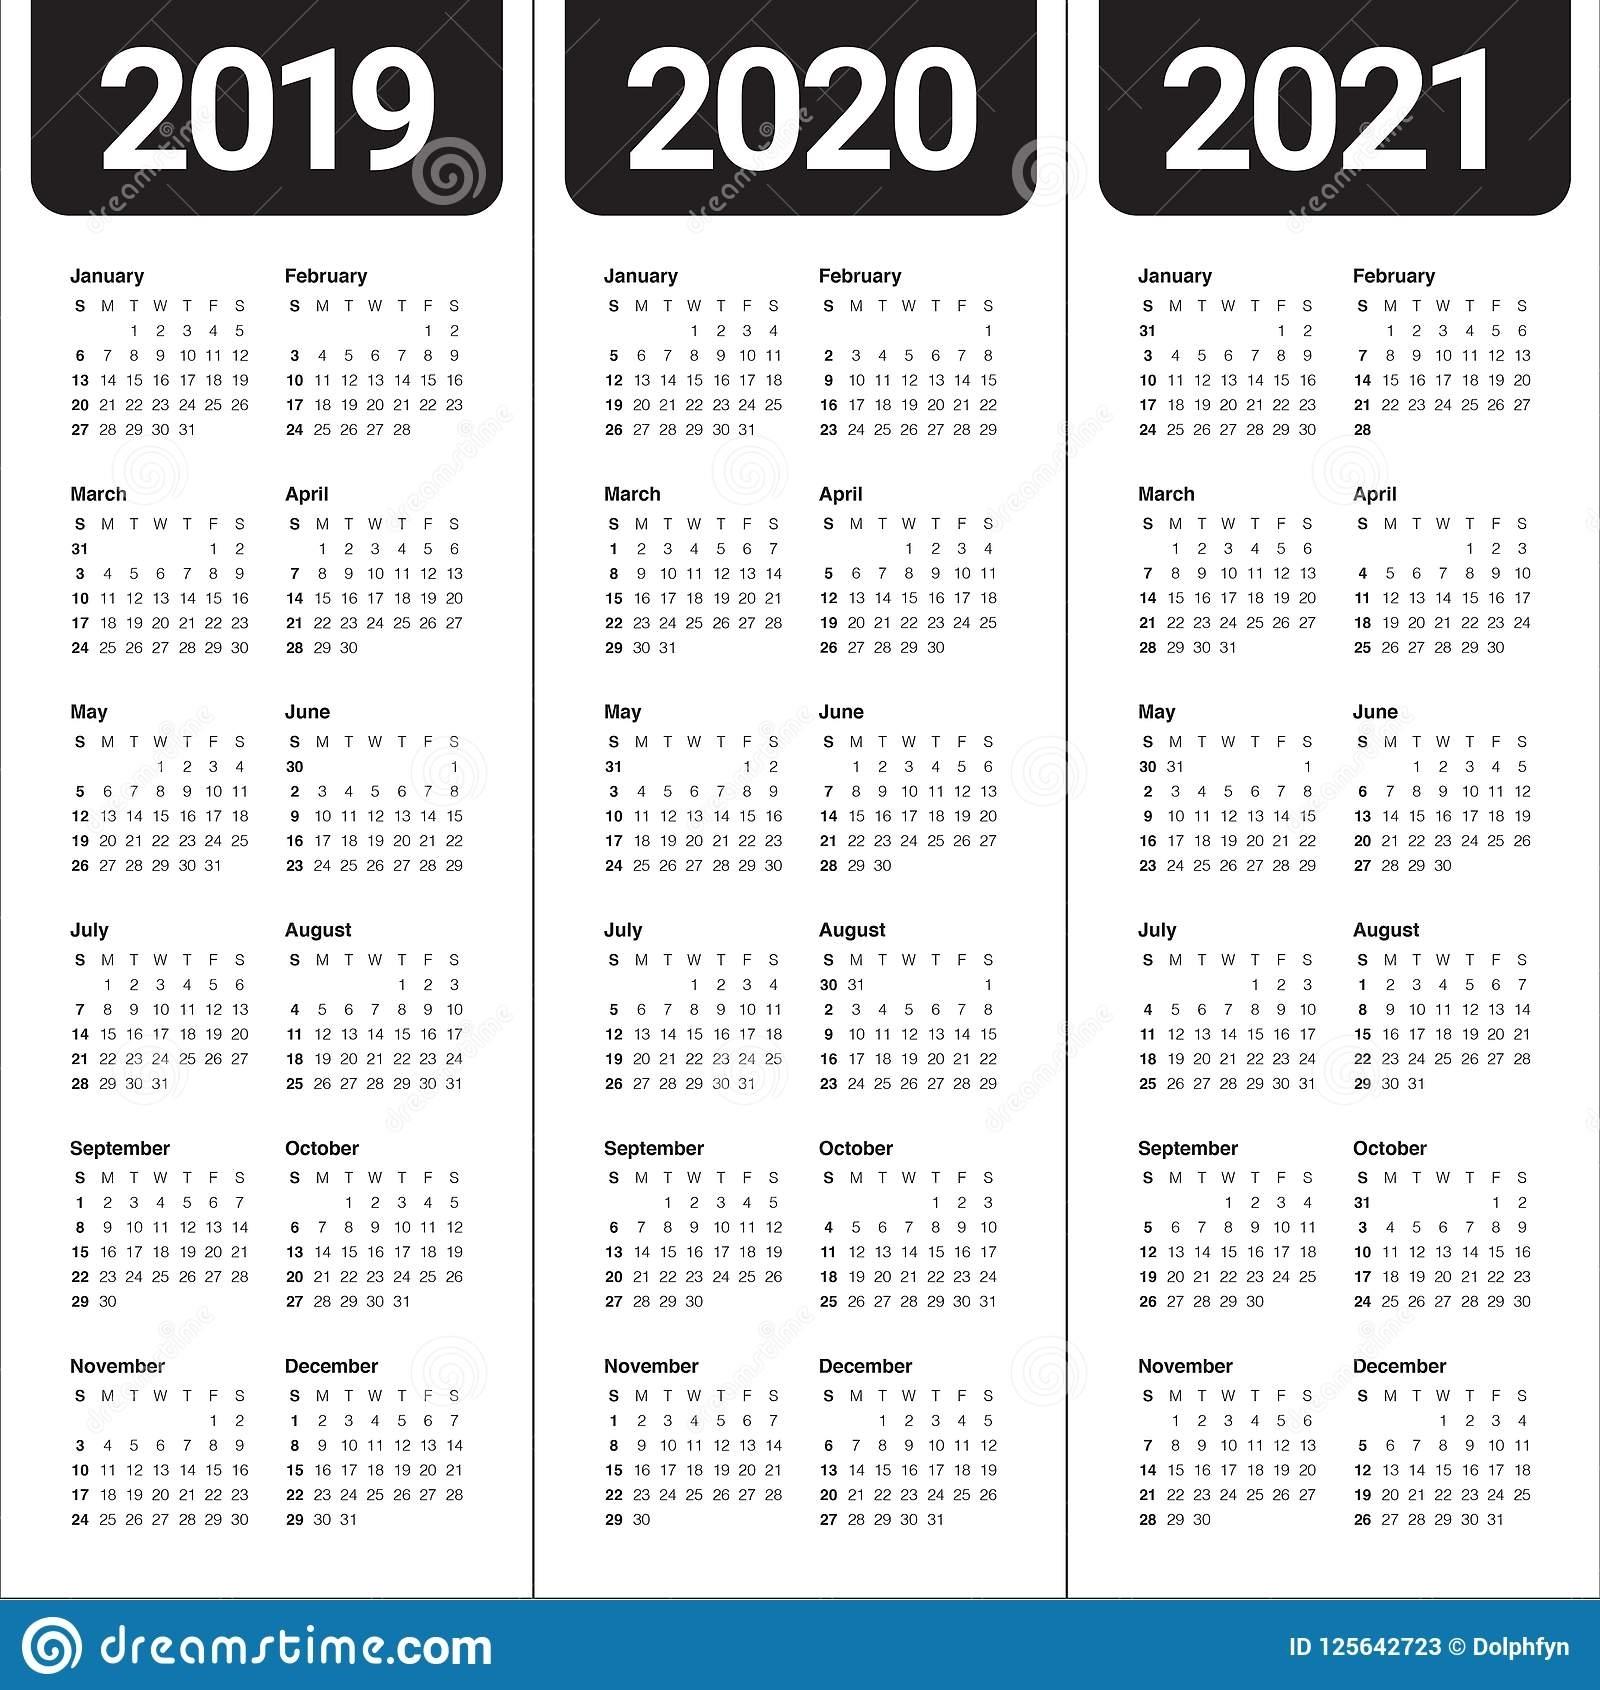 Year 2019 2020 2021 Calendar Vector Design Template Stock Vector intended for Calendar Yearly 2019 2020 2021